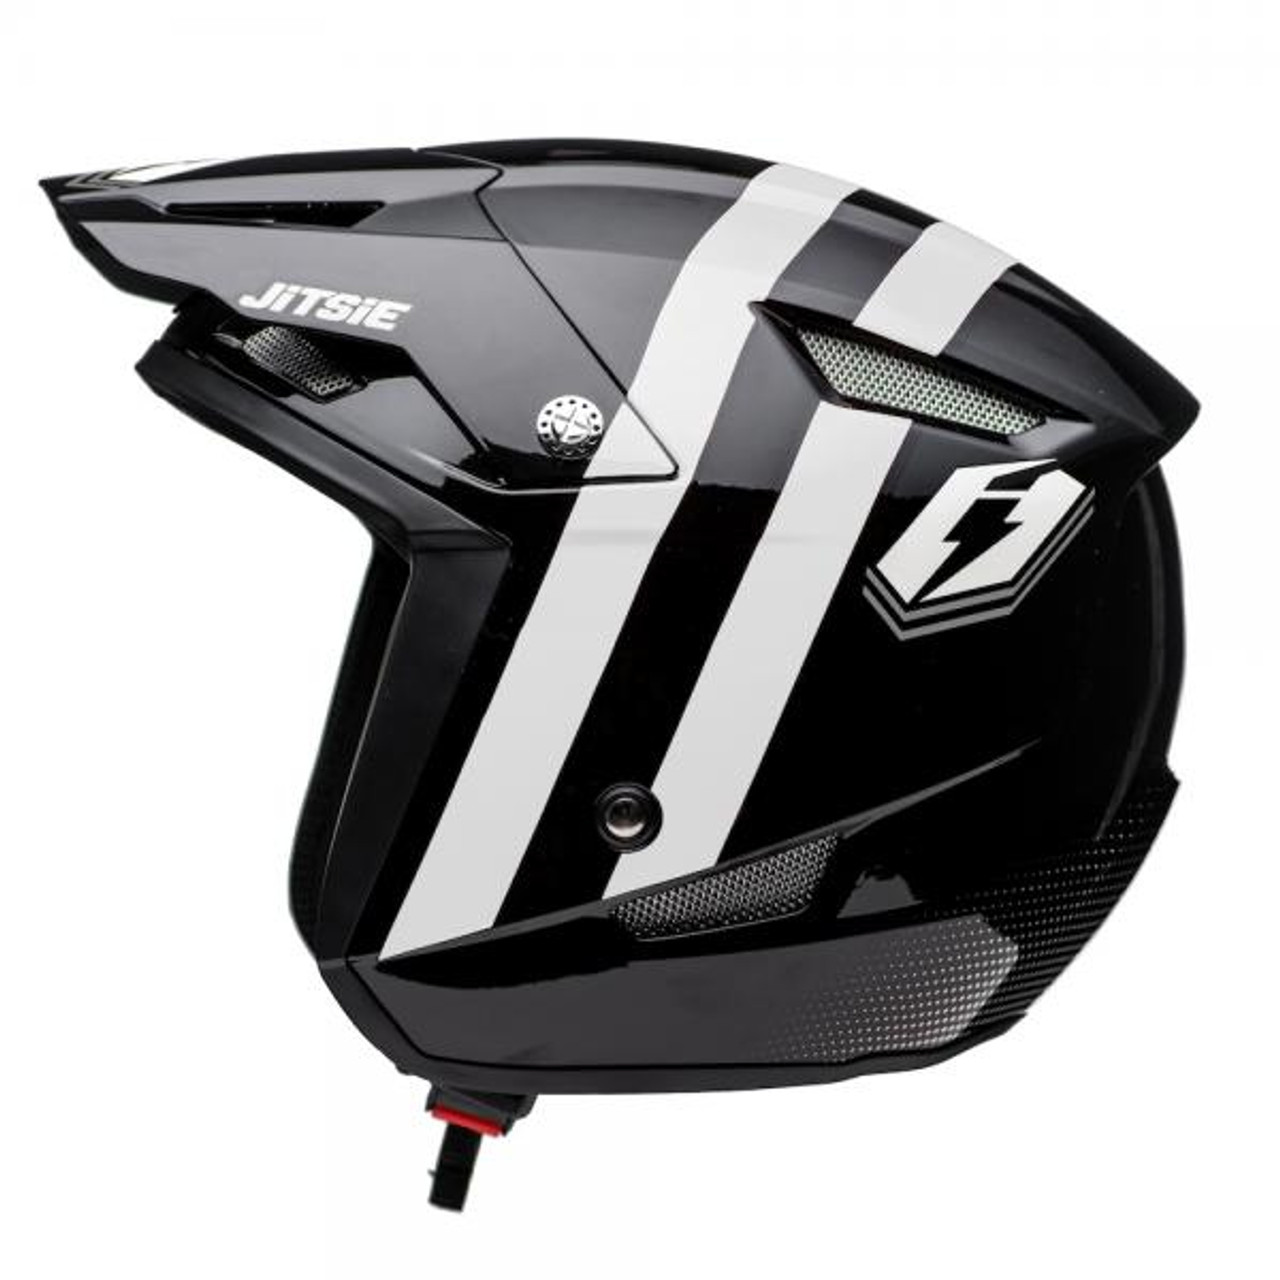 Helmet HT1 Voita, black/ white